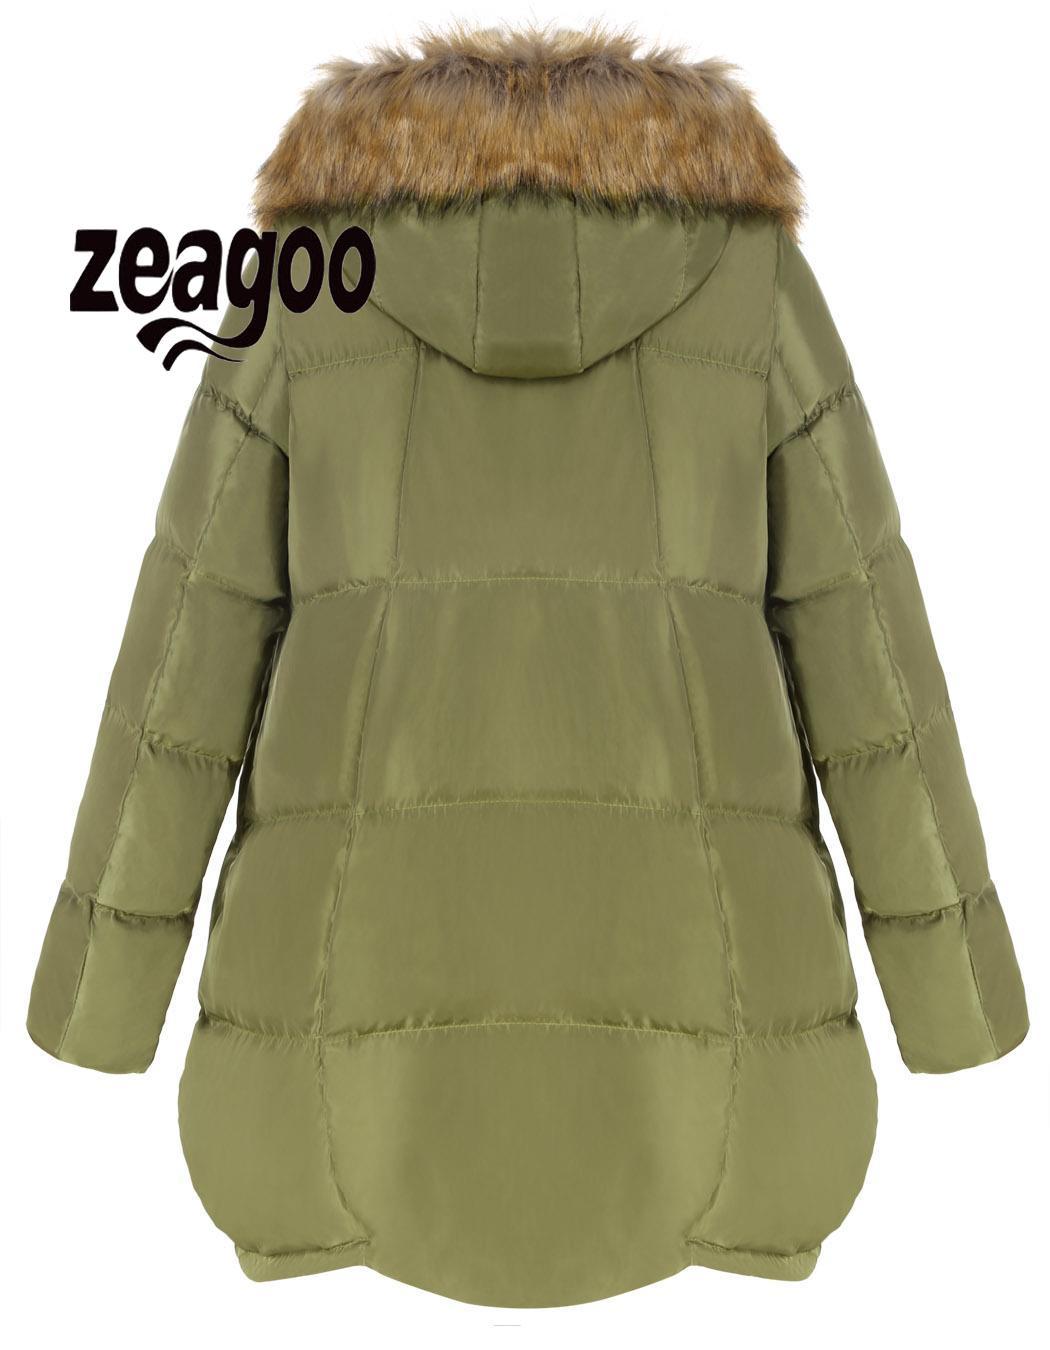 zeagoo Jacket Women Fashion Thick Fur Hooded Collar Long Sleeve Multi Pocket Meaneor Outwear Parka